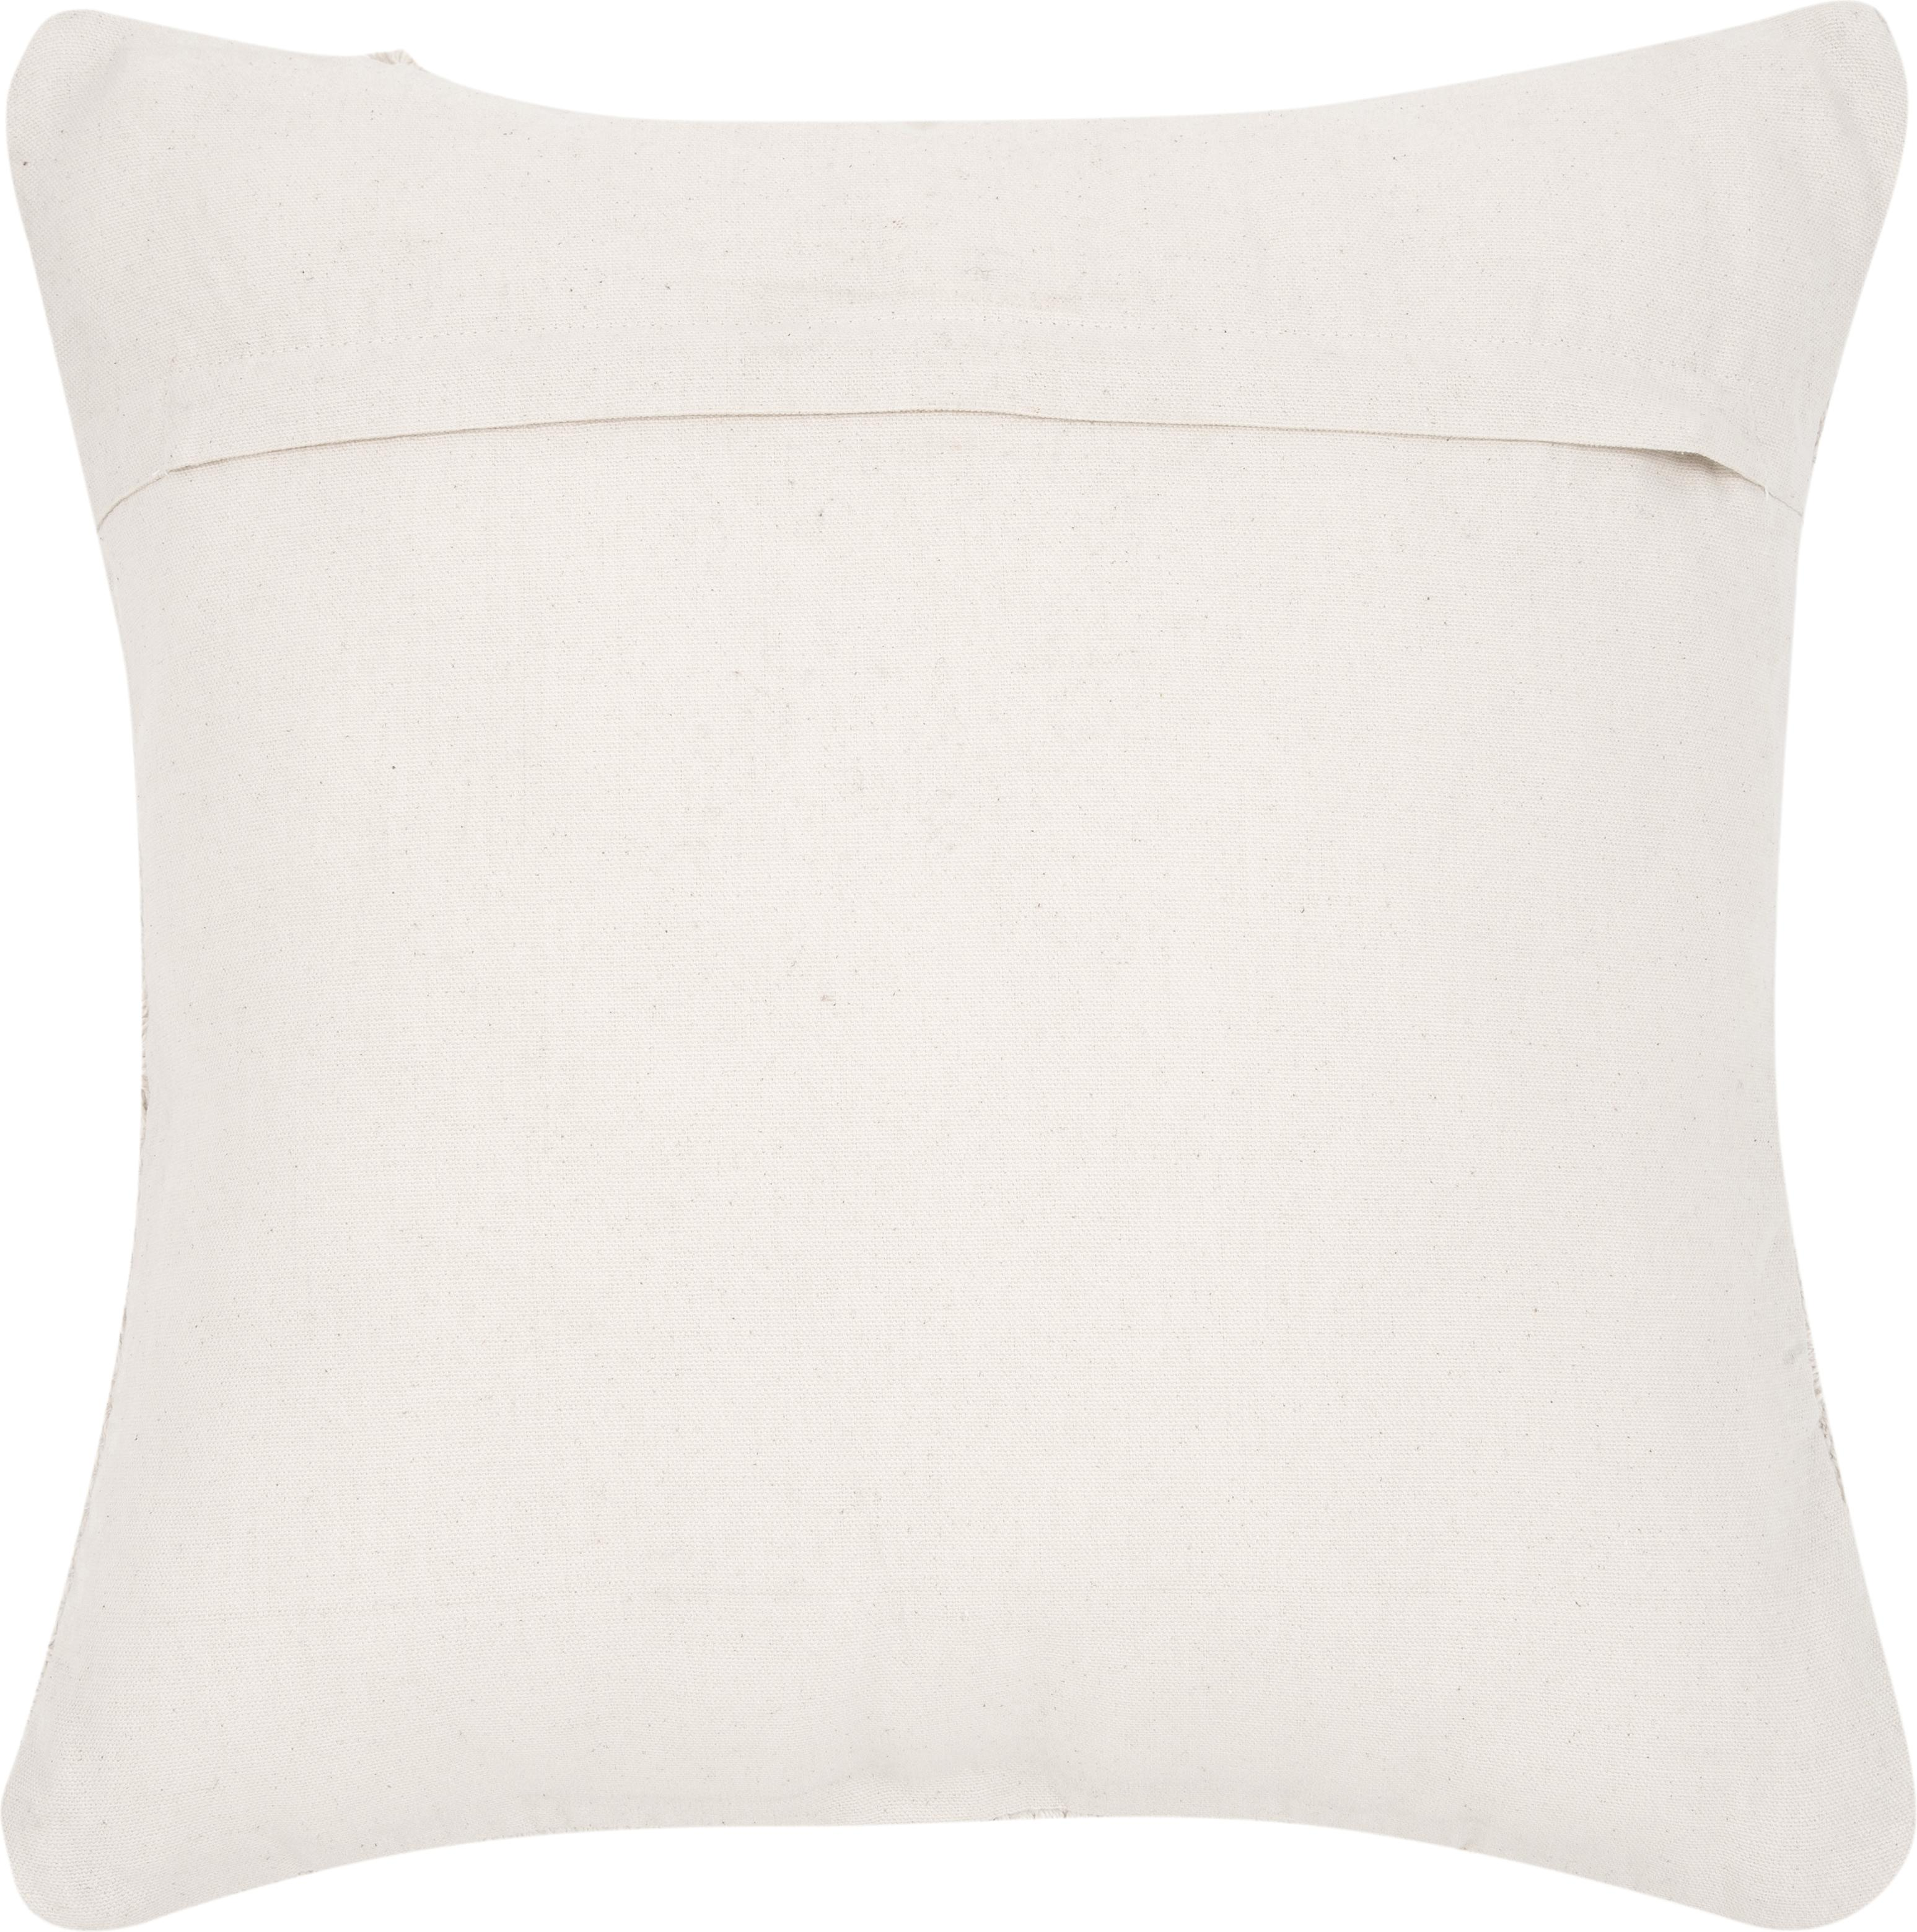 Poszewka na poduszkę Akesha, 100% bawełna, Ecru, S 45 x D 45 cm